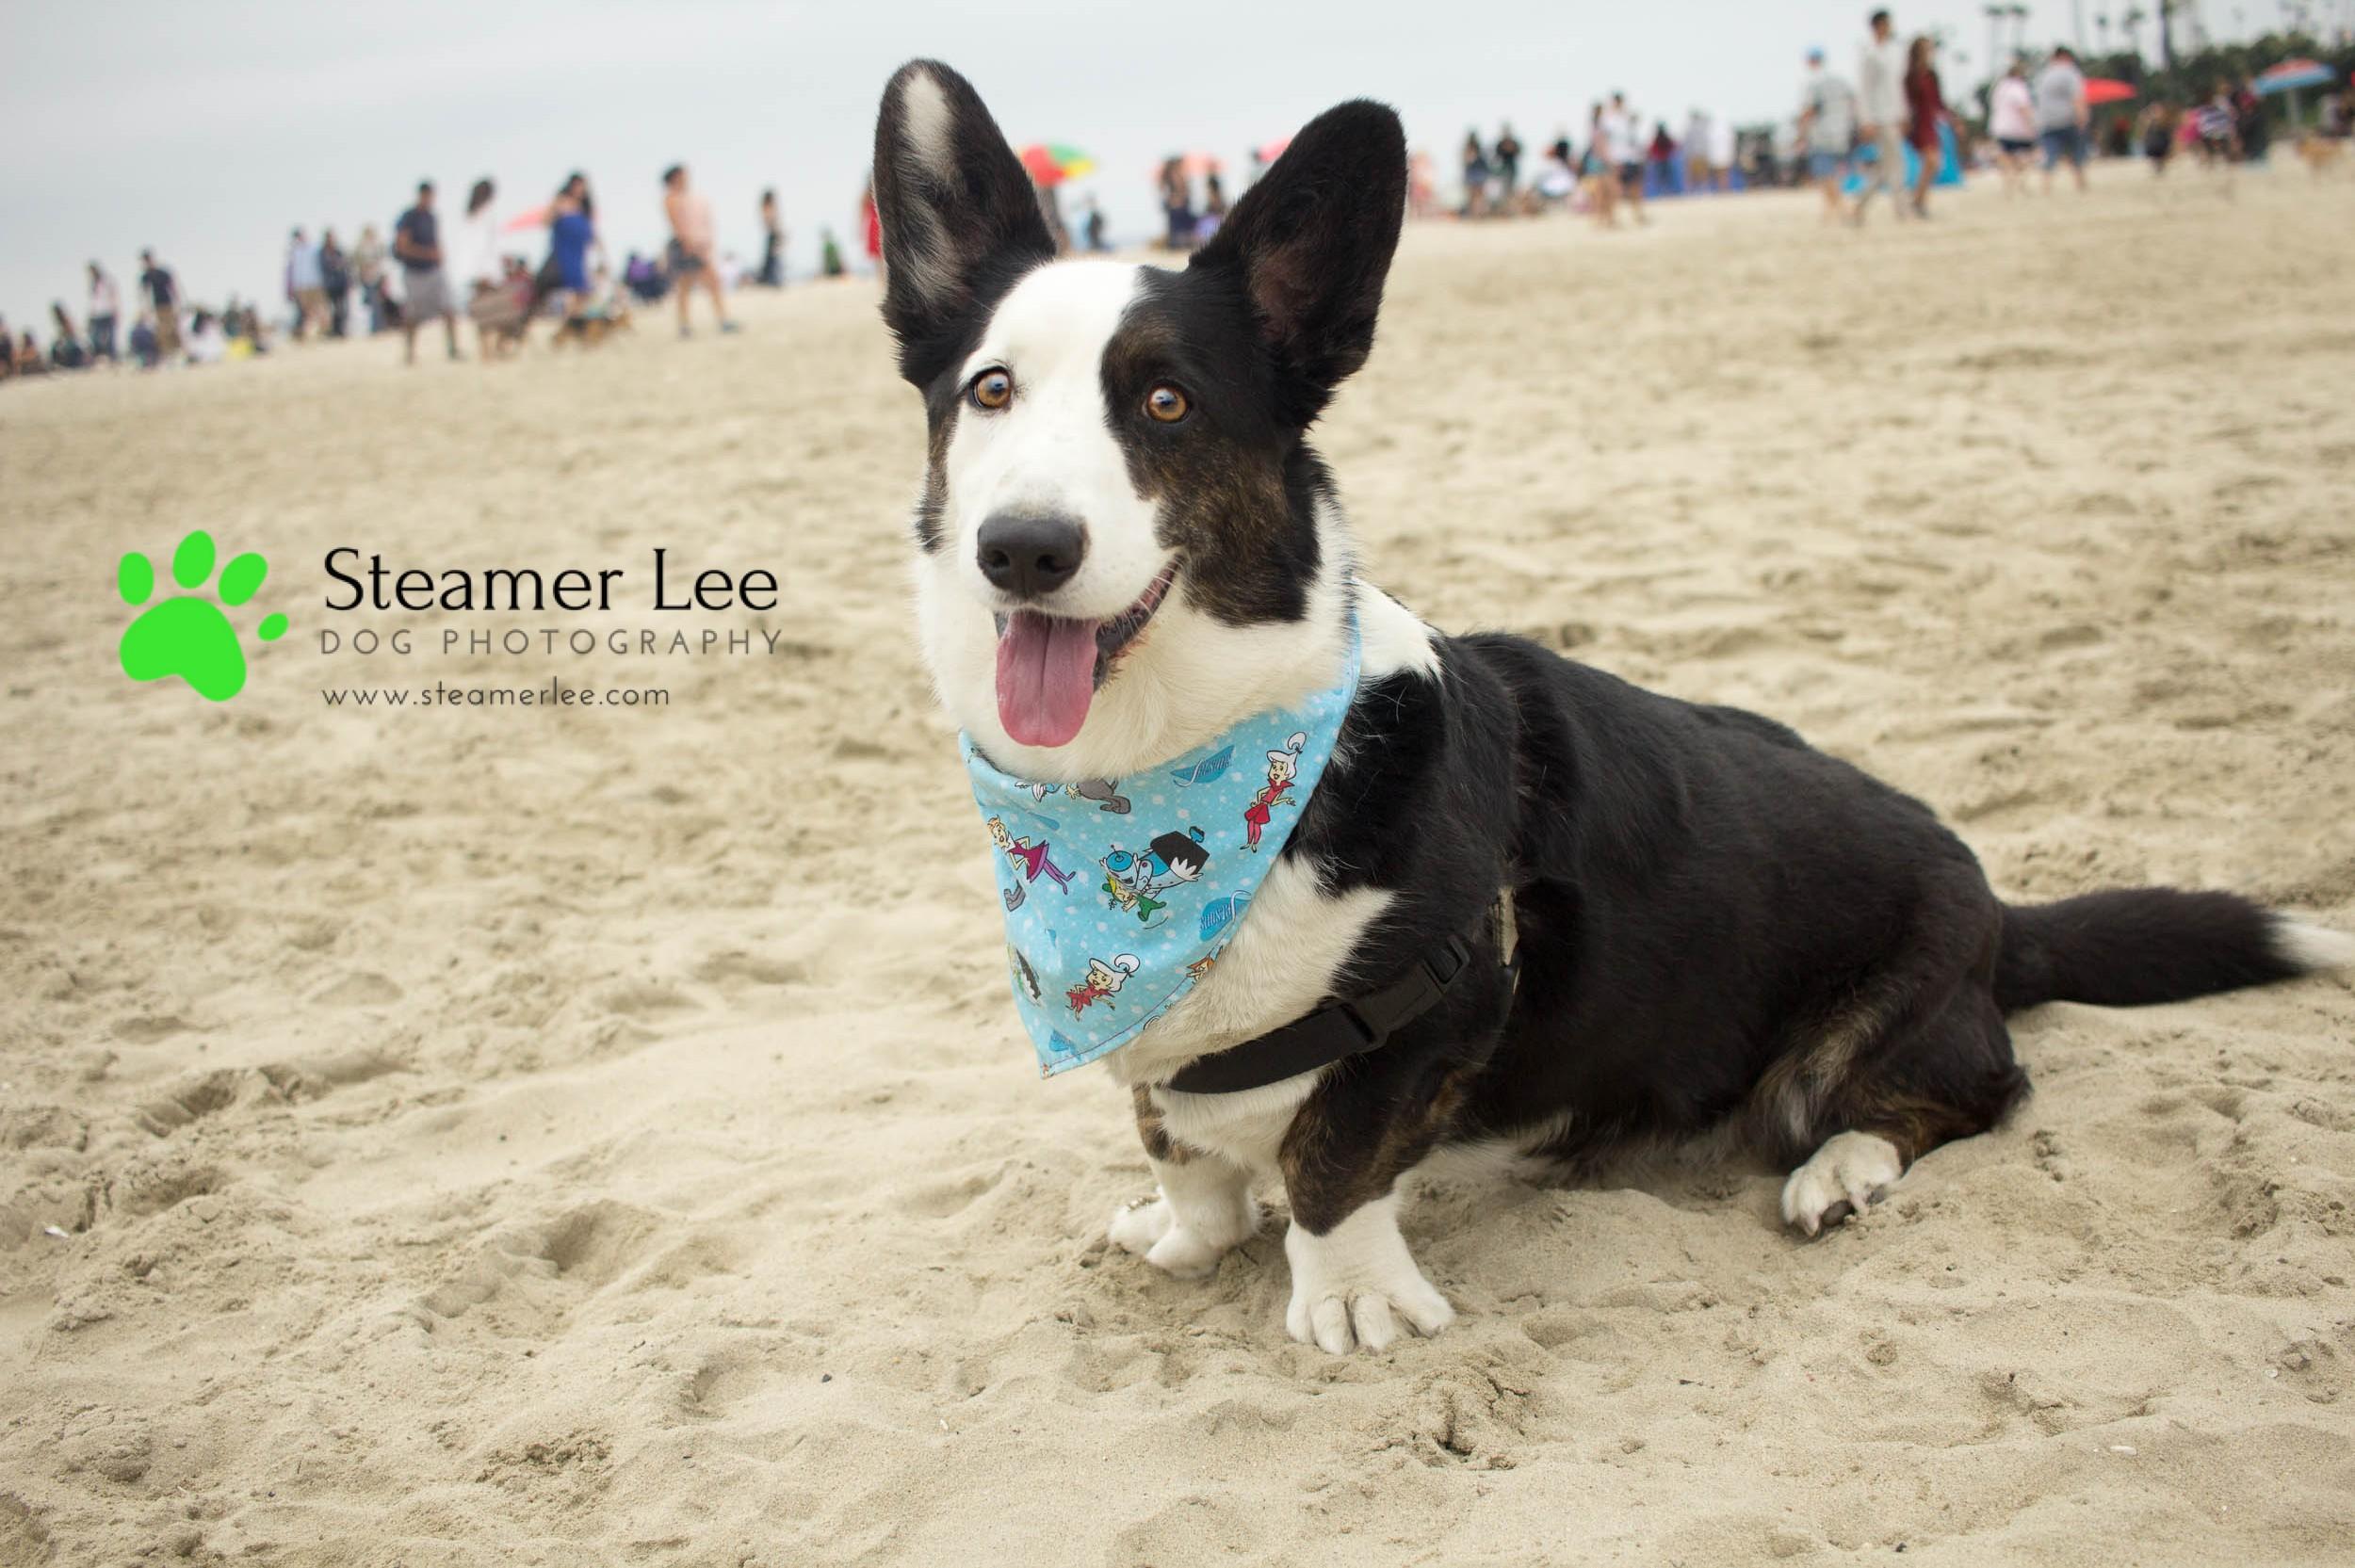 Steamer Lee Dog Photography - July 2017 So Cal Corgi Beach Day - Vol.2 - 2.jpg